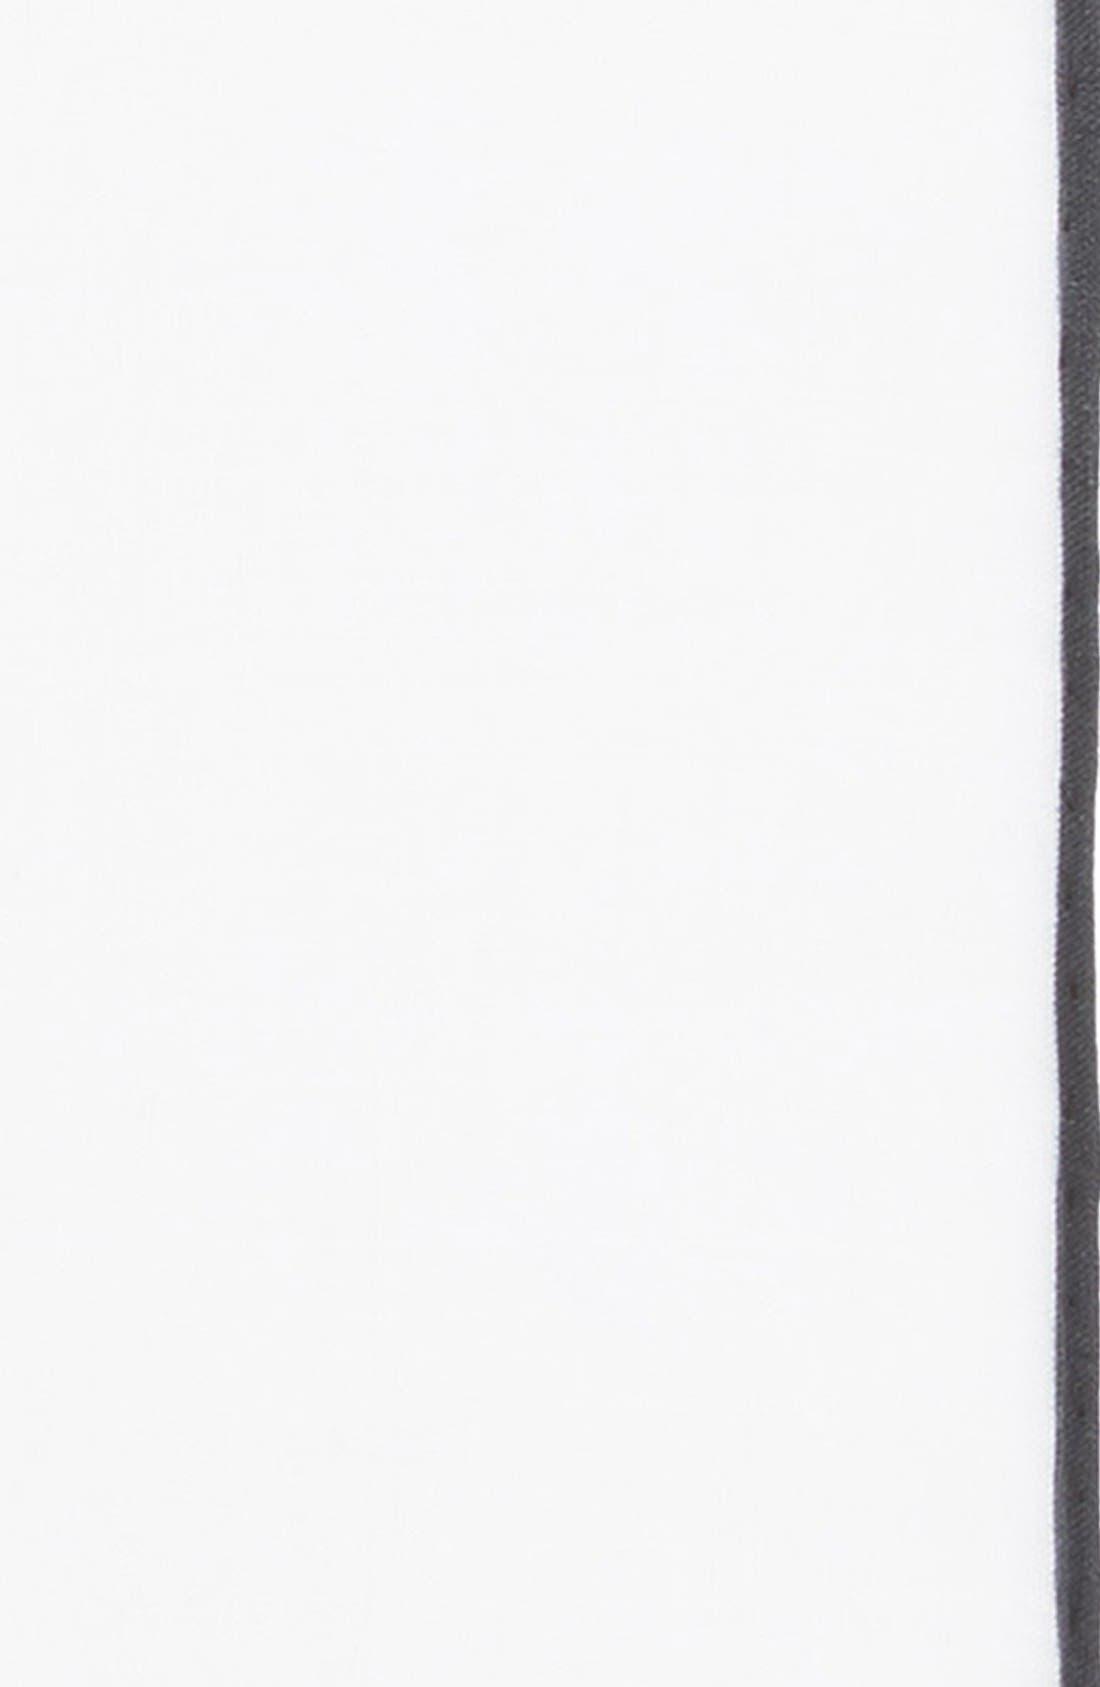 Alternate Image 3  - The Tie Bar Solid Linen Pocket Square